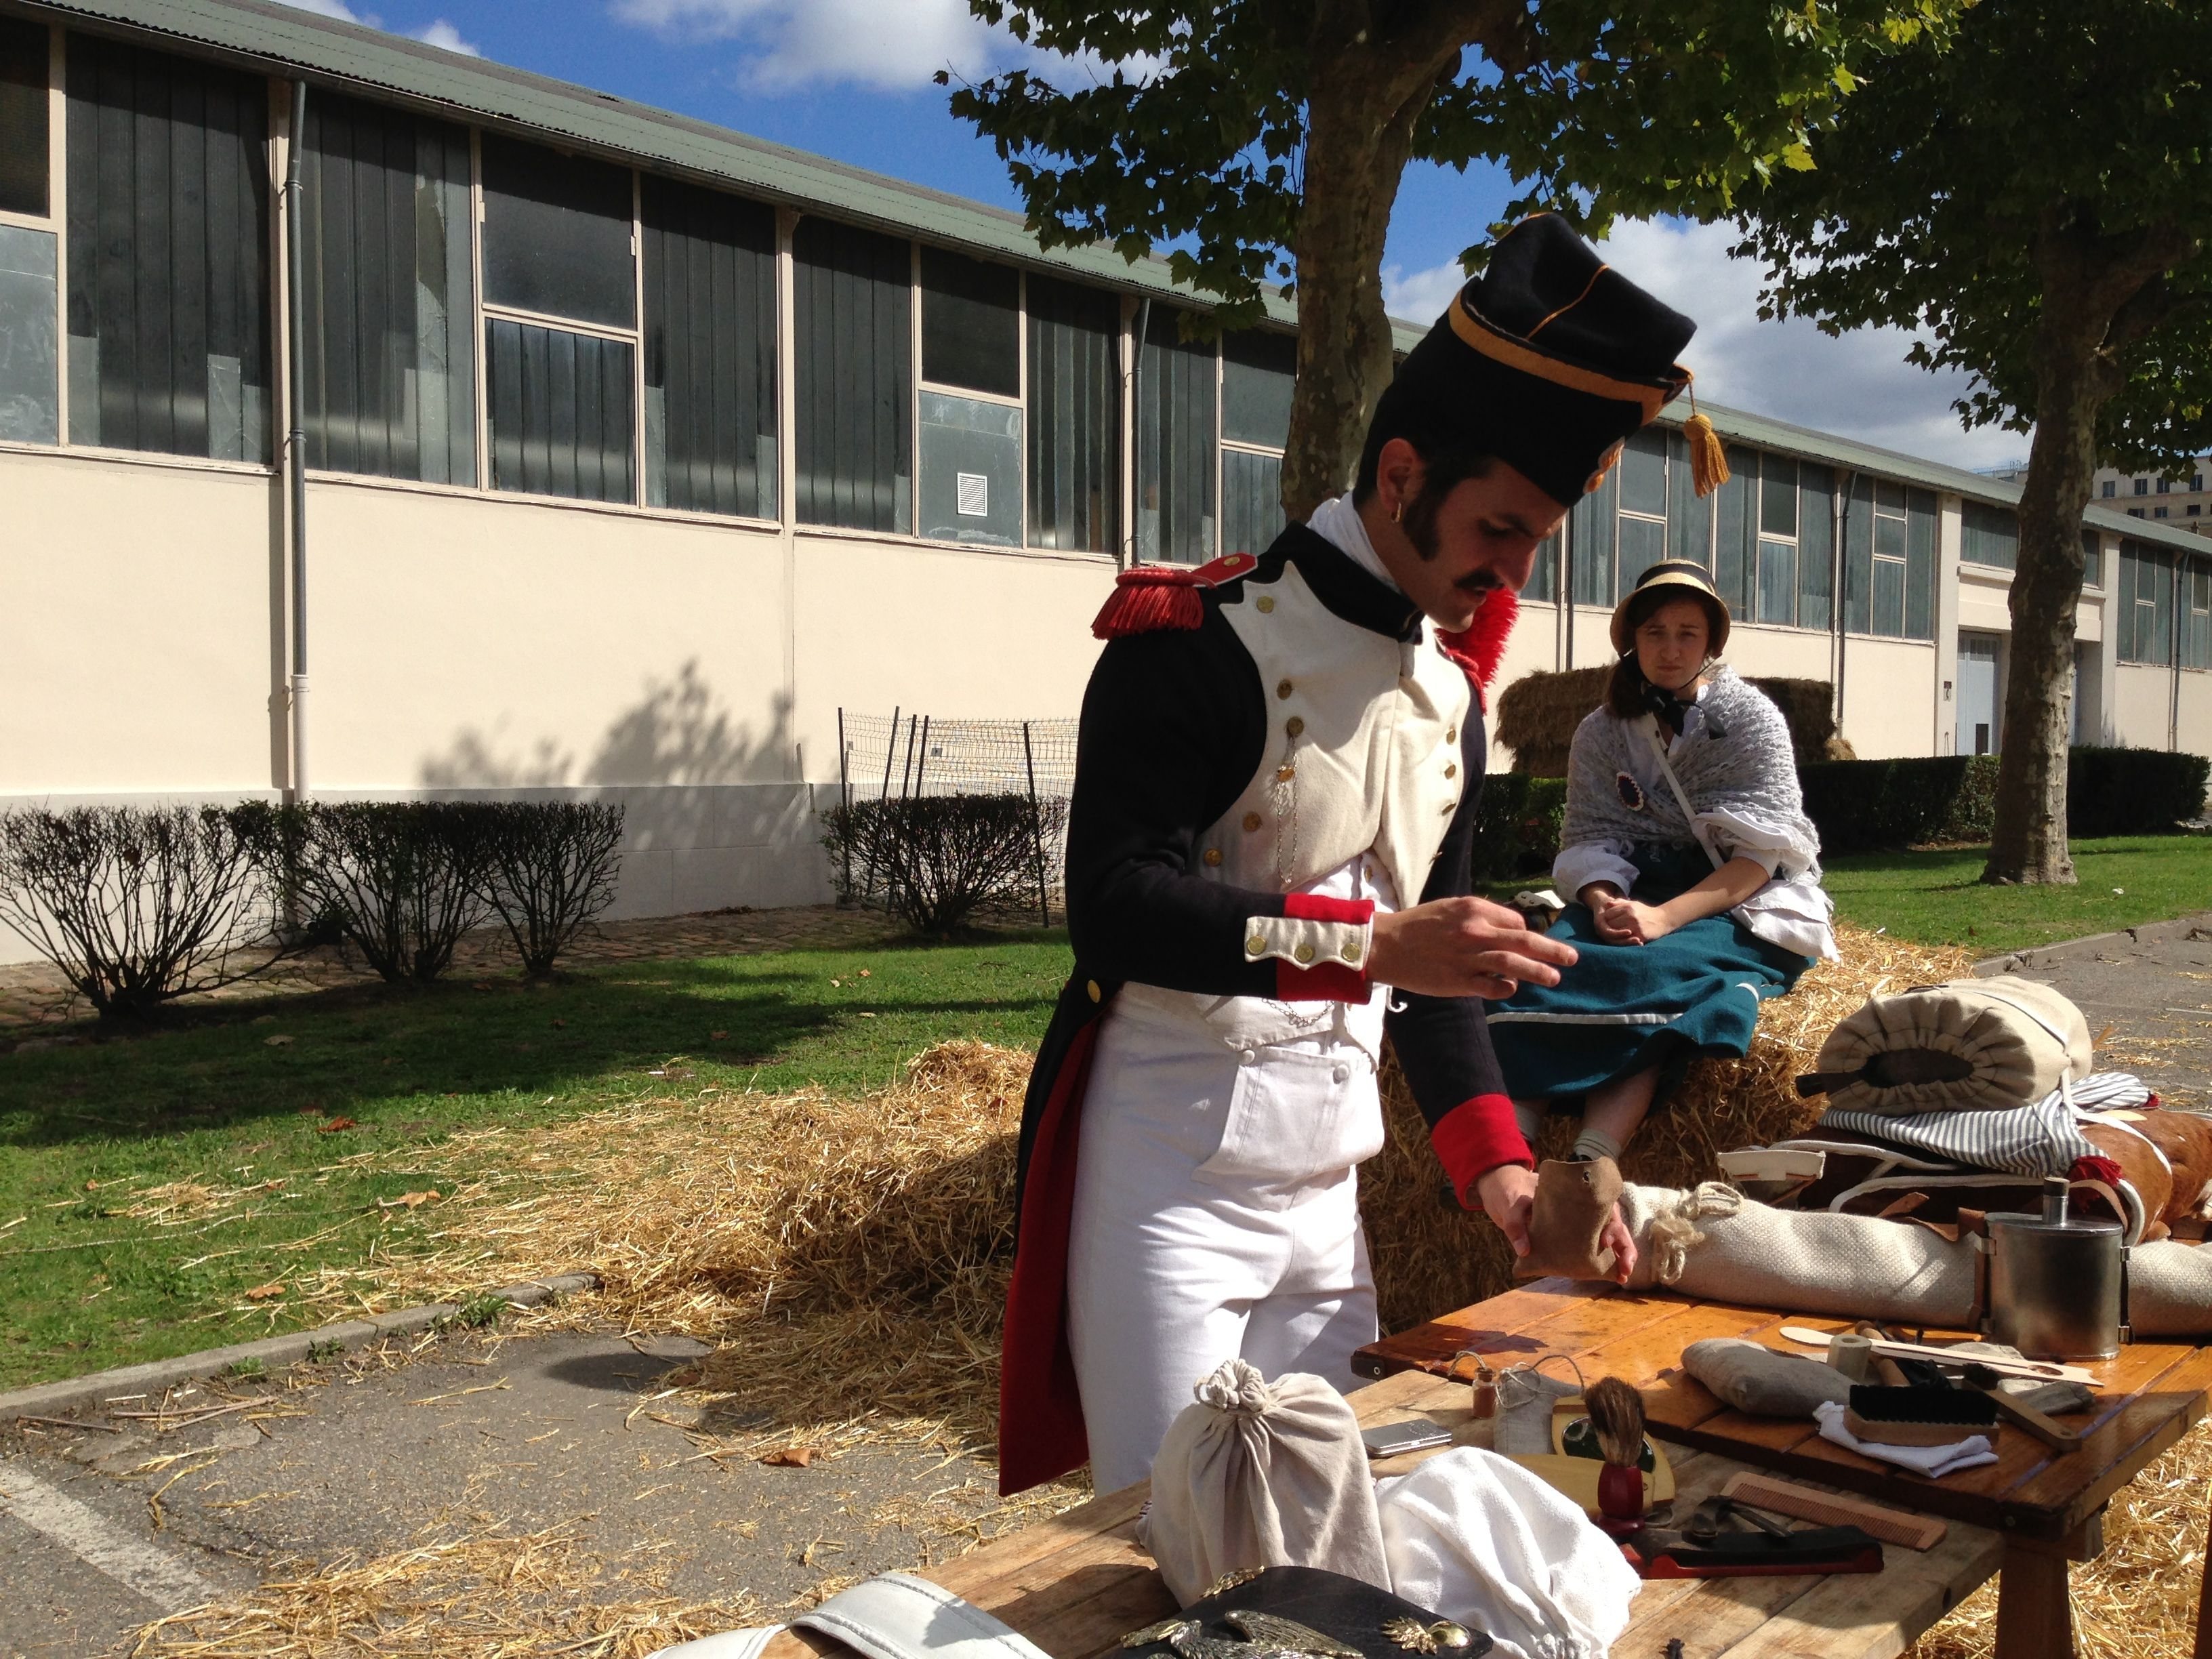 201 Cole Militaire Napol 233 On Bonaparte S Student Days